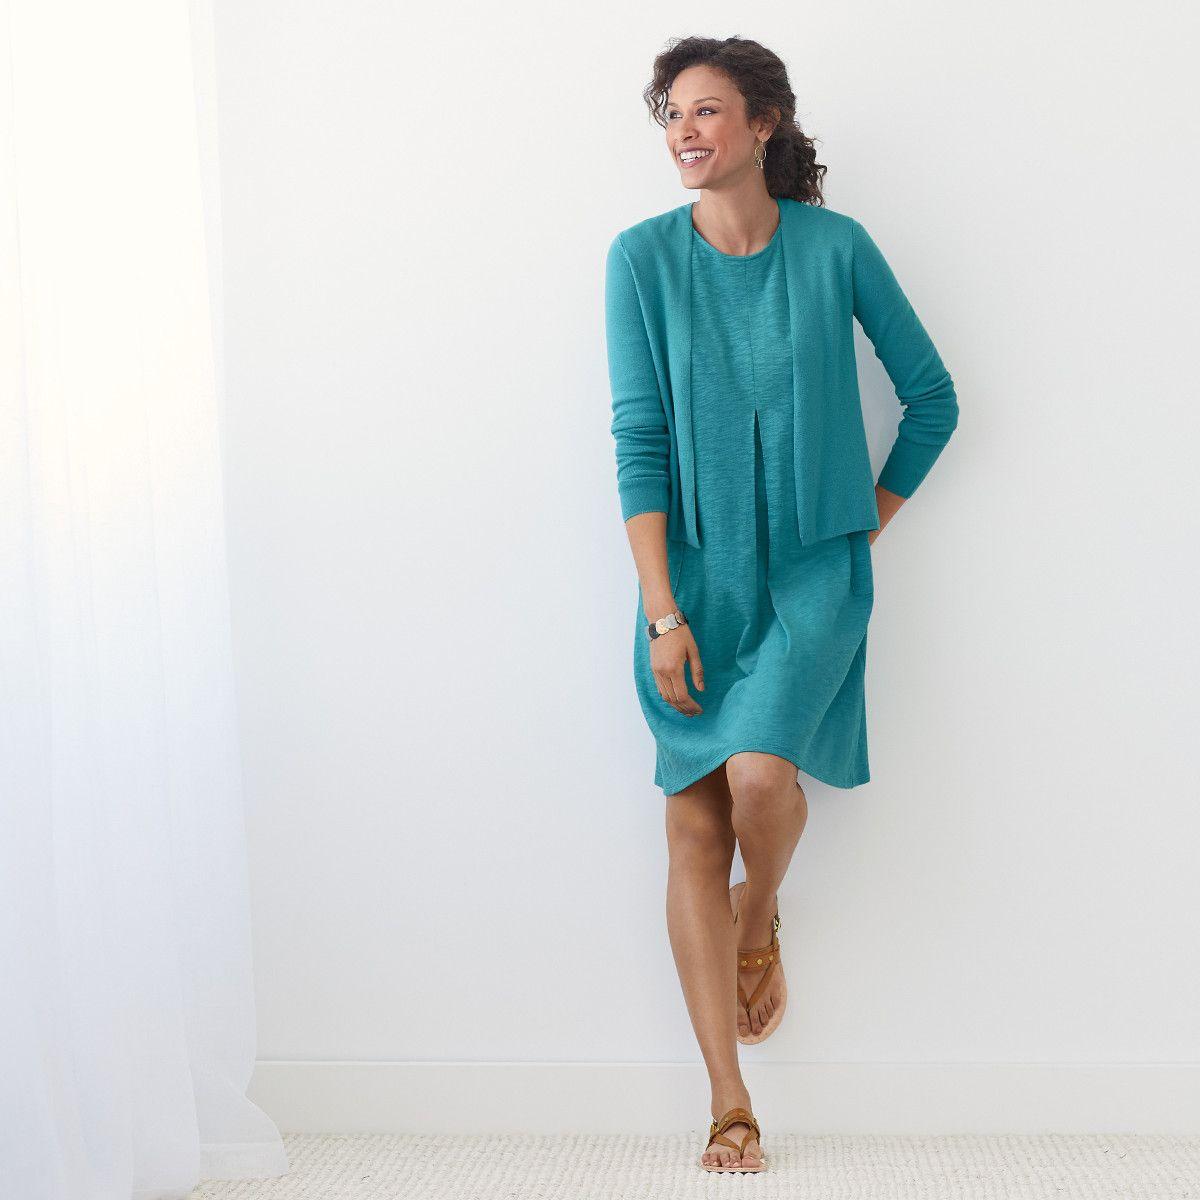 Light Fresh For Summer Featuring J Jill S Sleeveless Center Pleat Knit Dress Clothes For Women Fashion Summer Fashion [ 1200 x 1200 Pixel ]